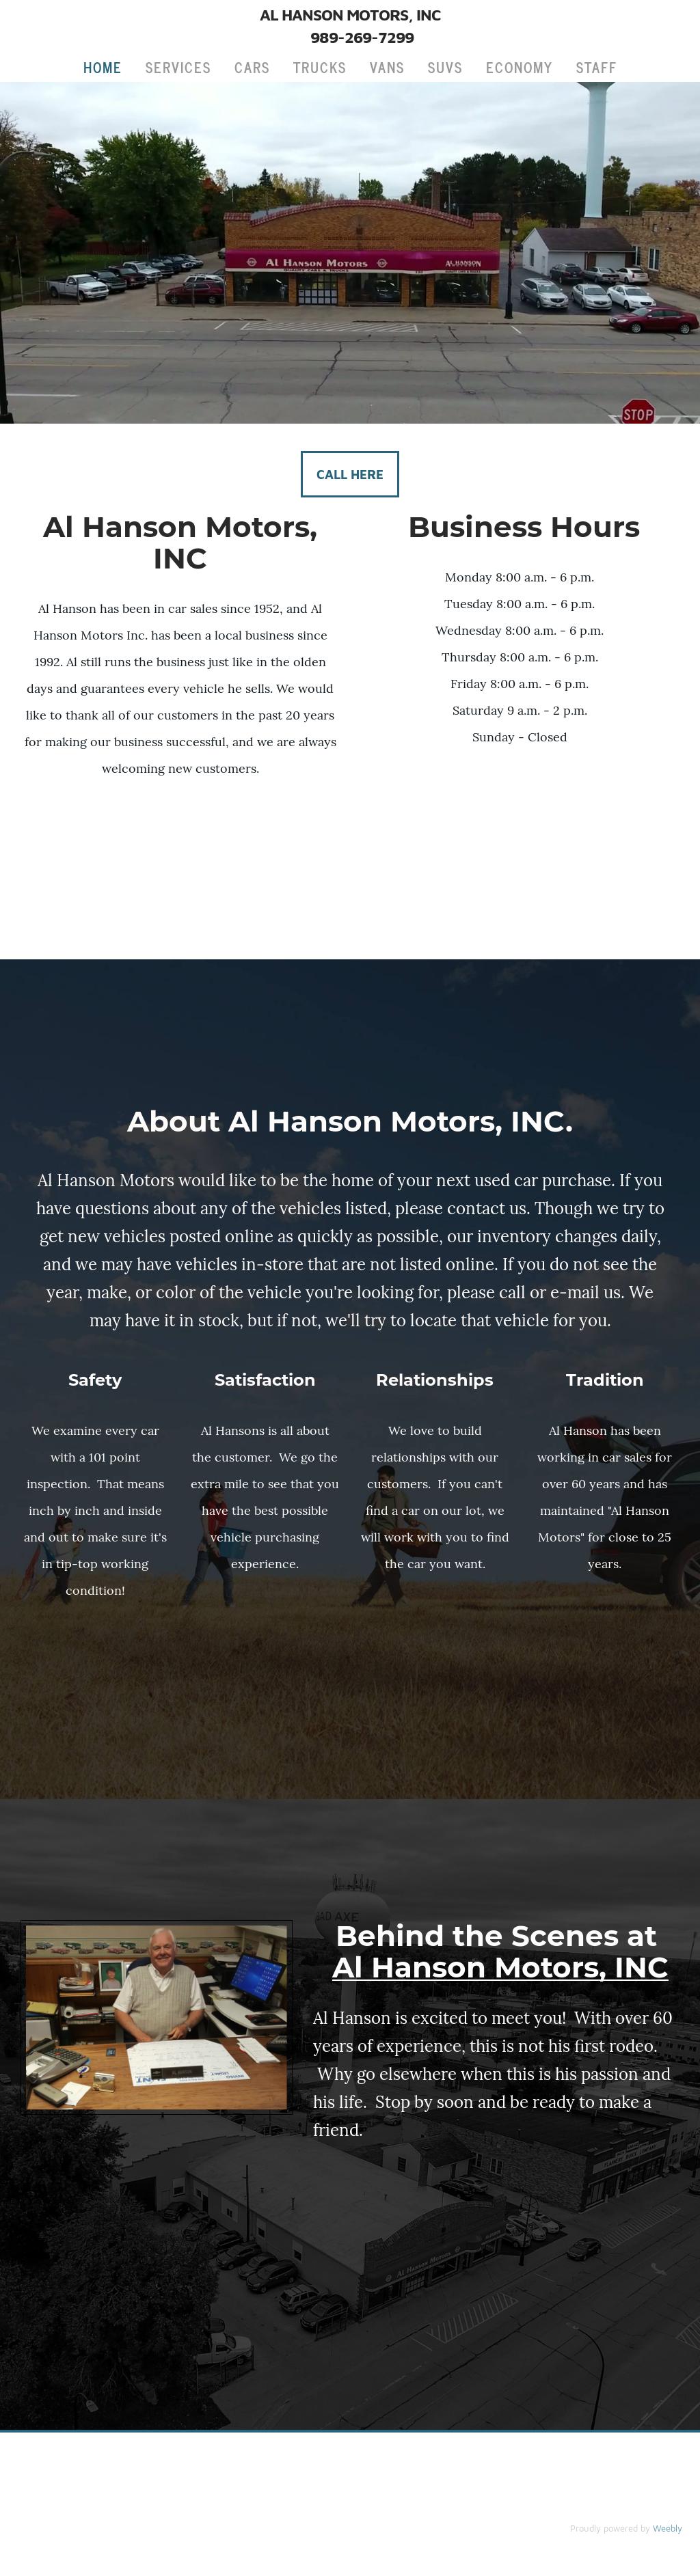 Al Hanson Motors website history